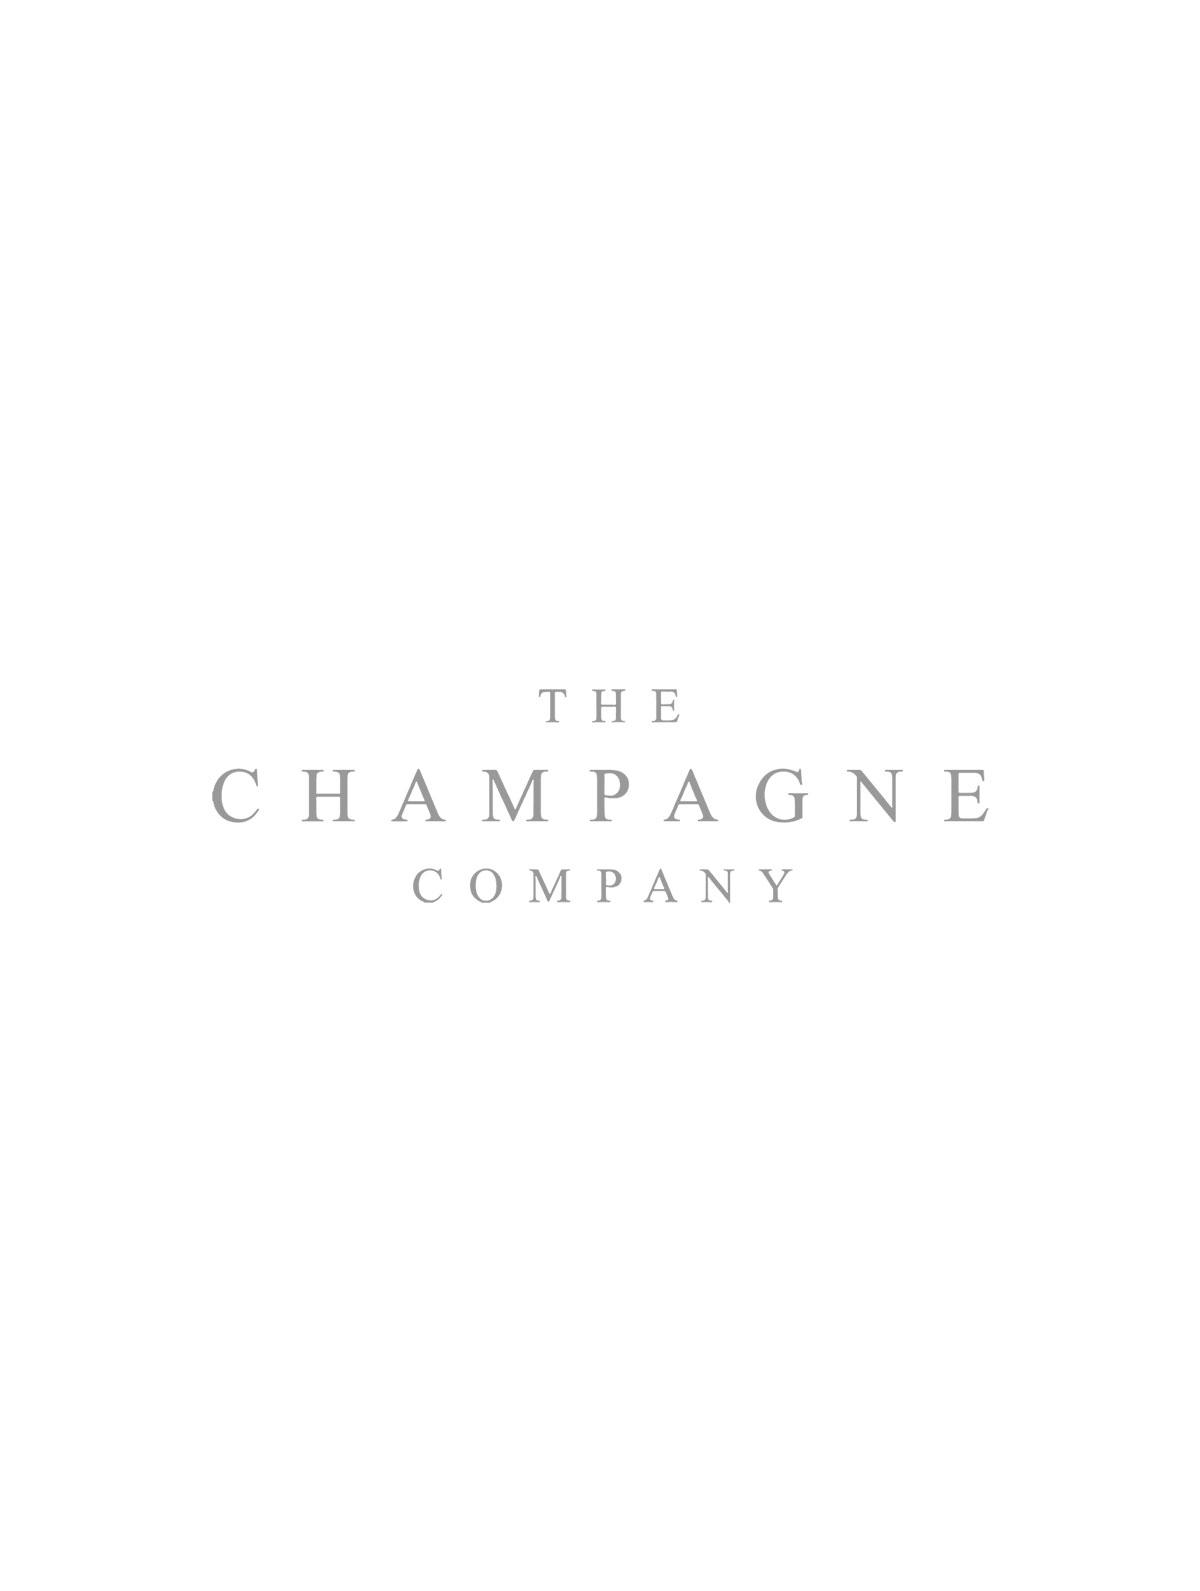 Wiston English Sparkling Wine Blue Gift Box 75cl